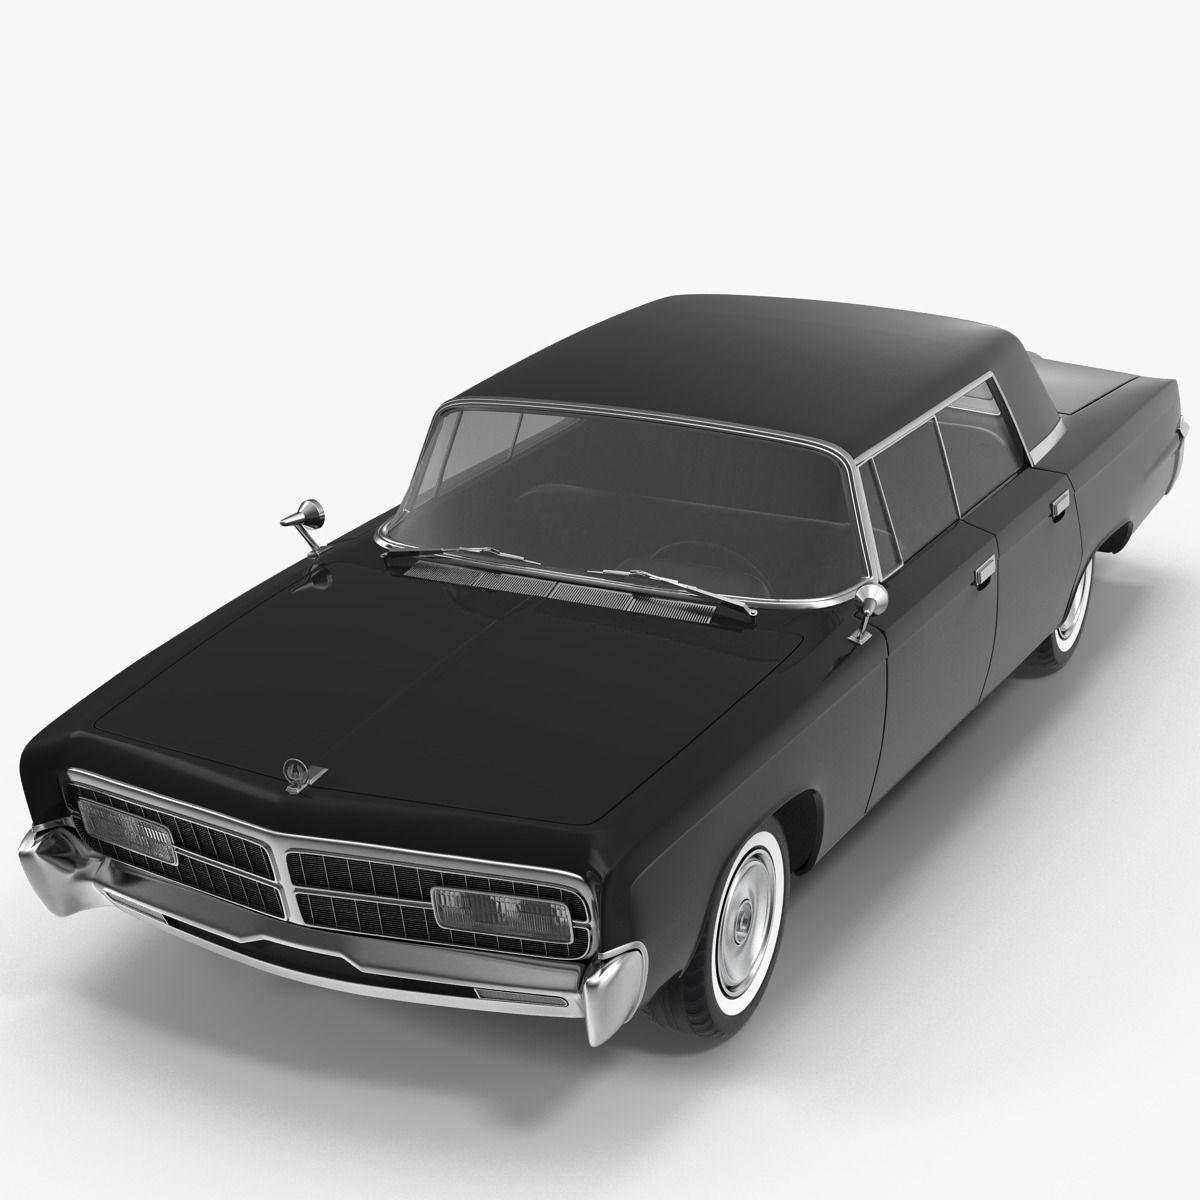 Chrysler imperial Crow